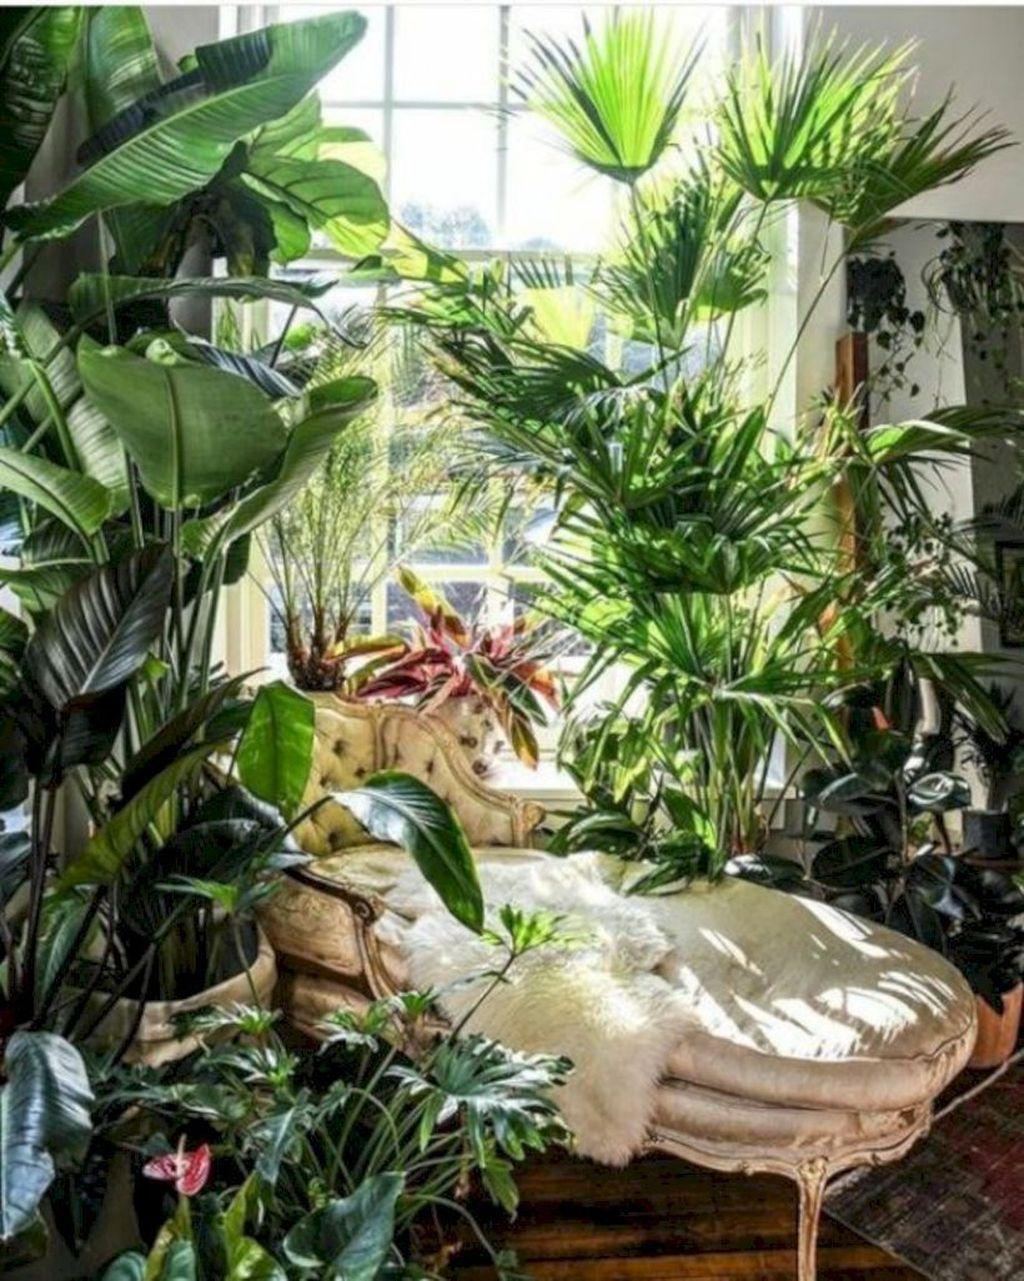 The Best Indoor Garden Ideas To Beautify Your Home 27